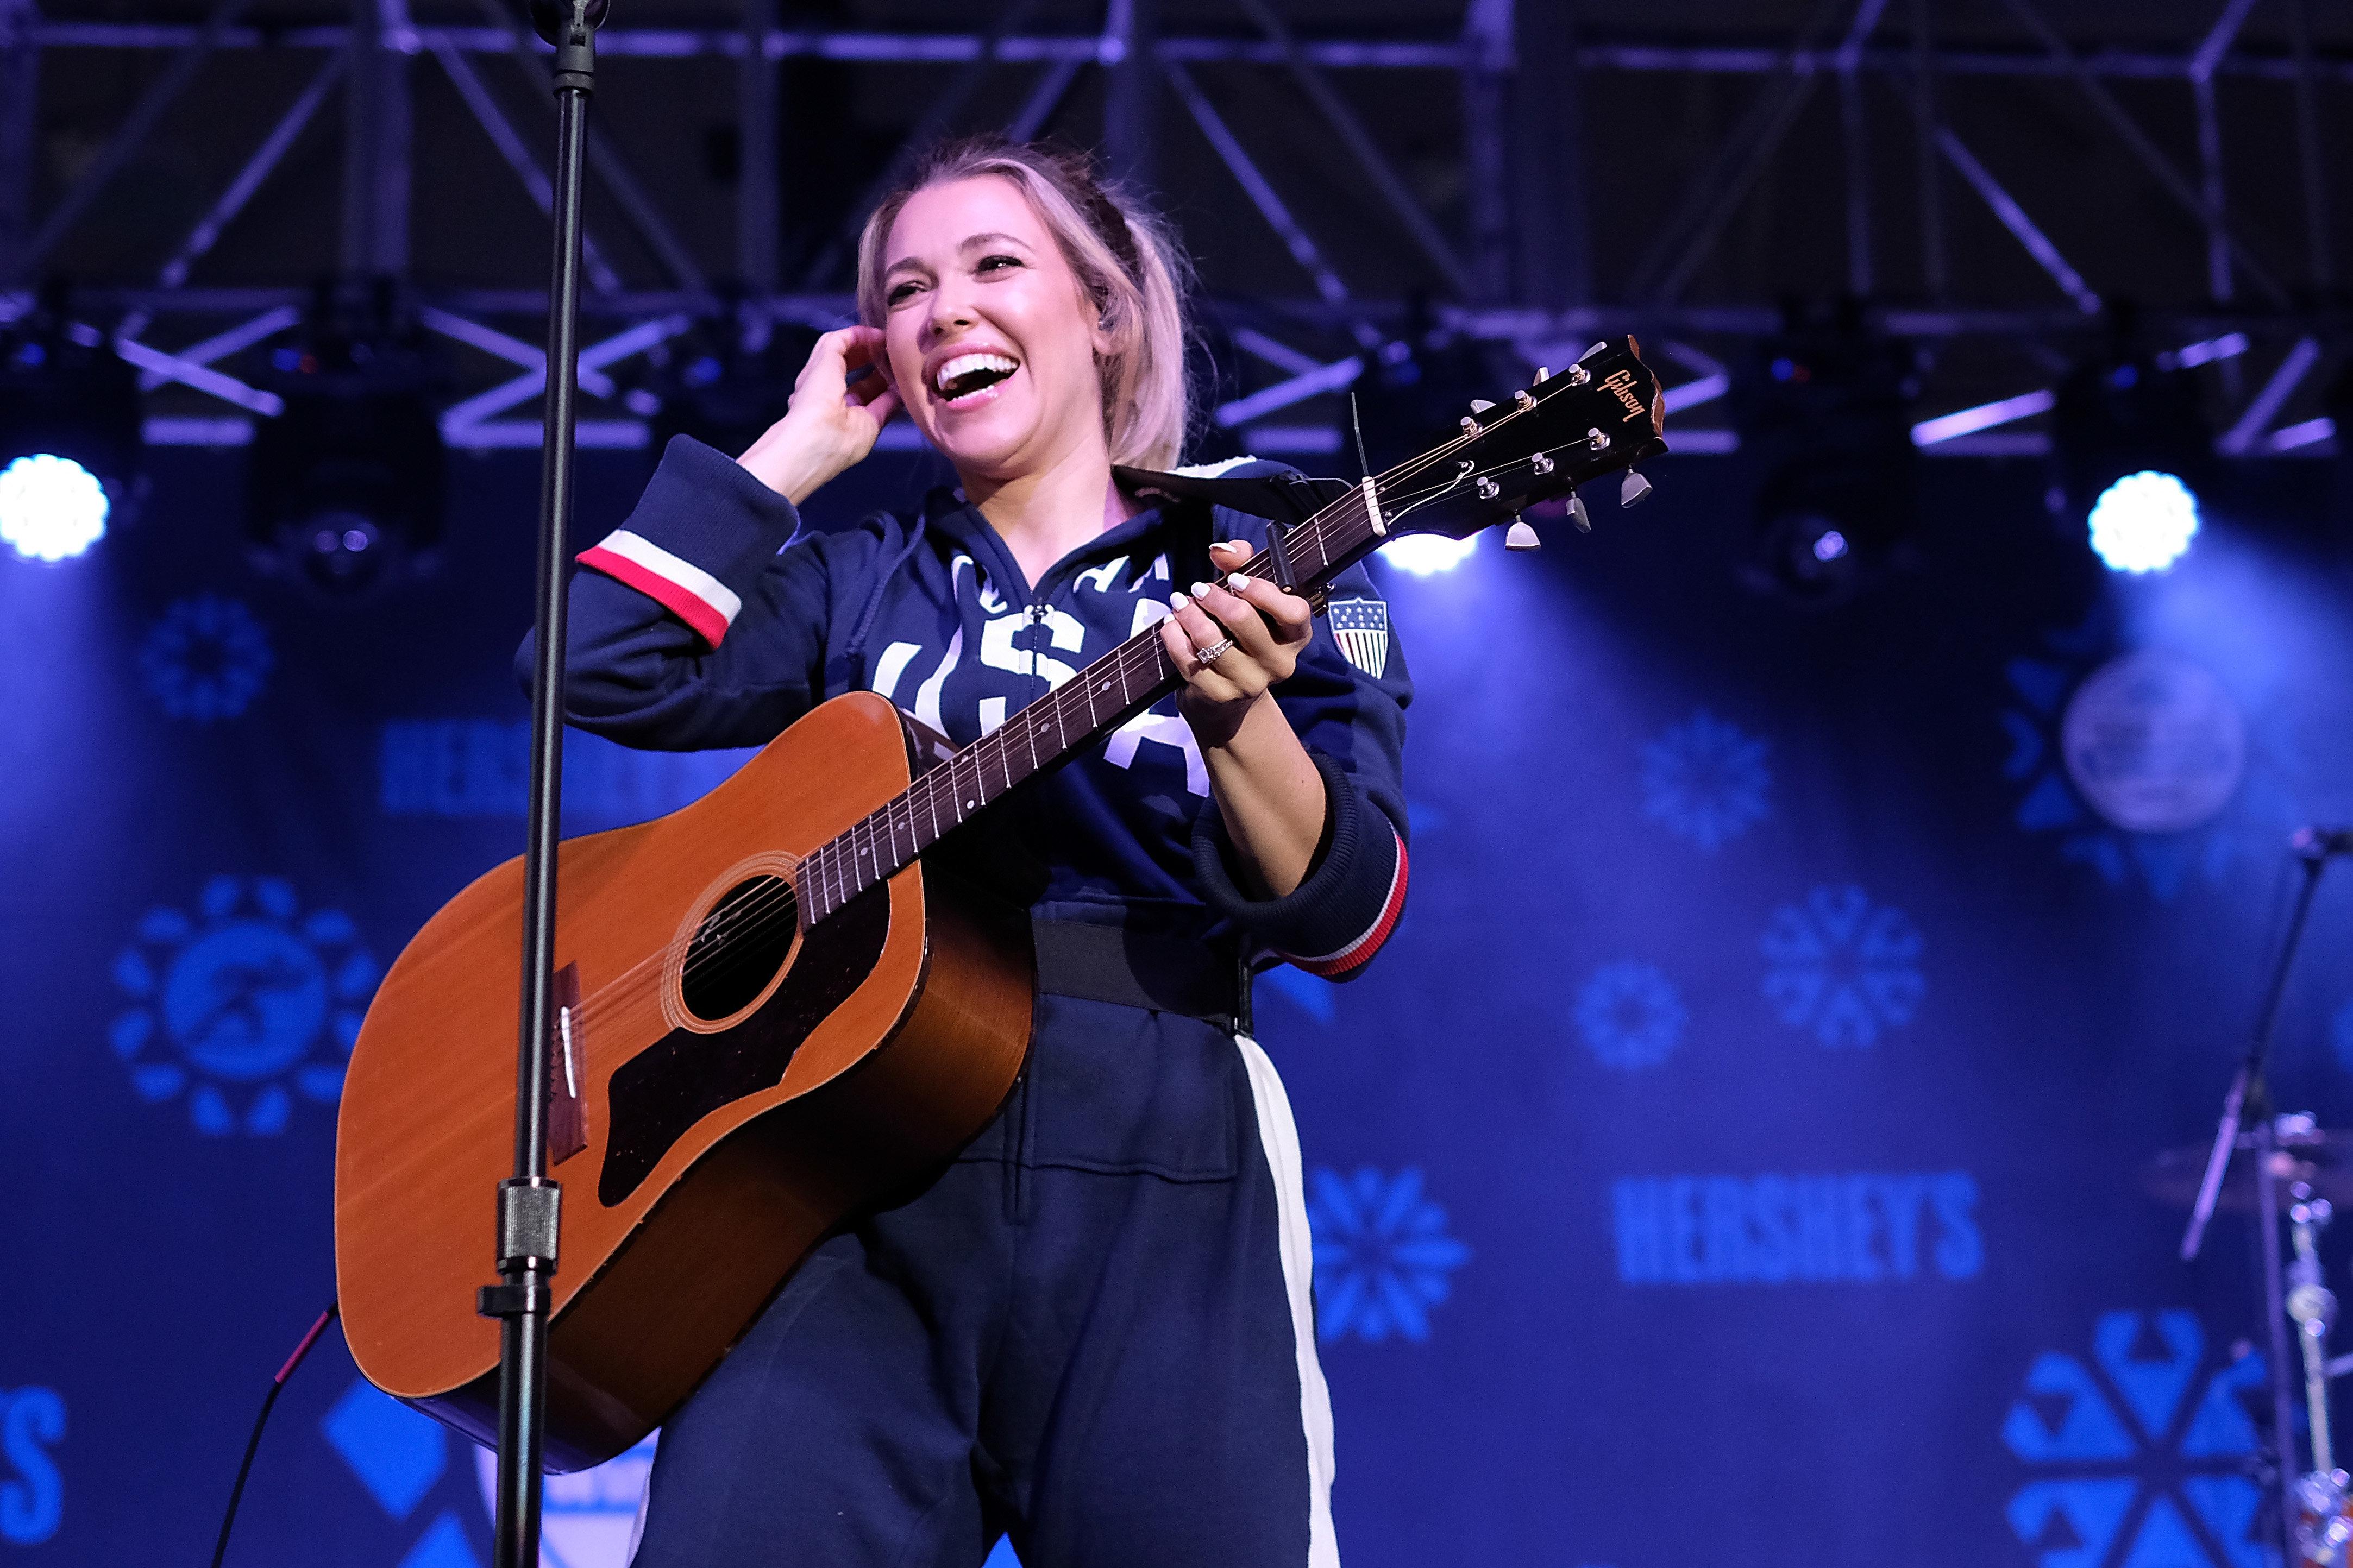 Rachel Platten Flubs National Anthem Performance, Asks Audience for Help